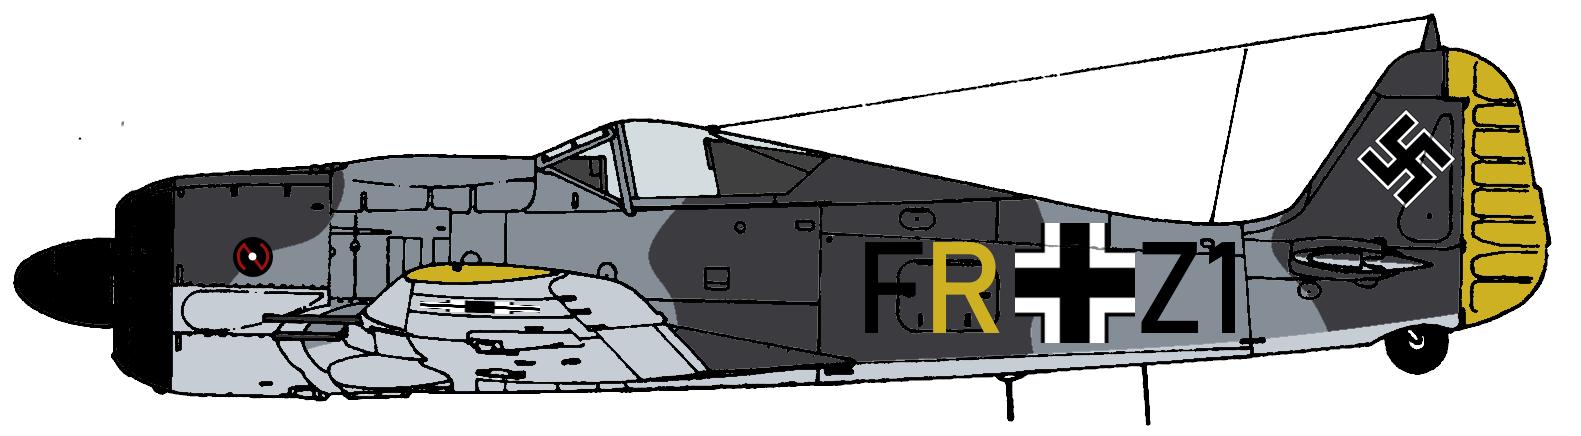 Zemesis Fw 190.png